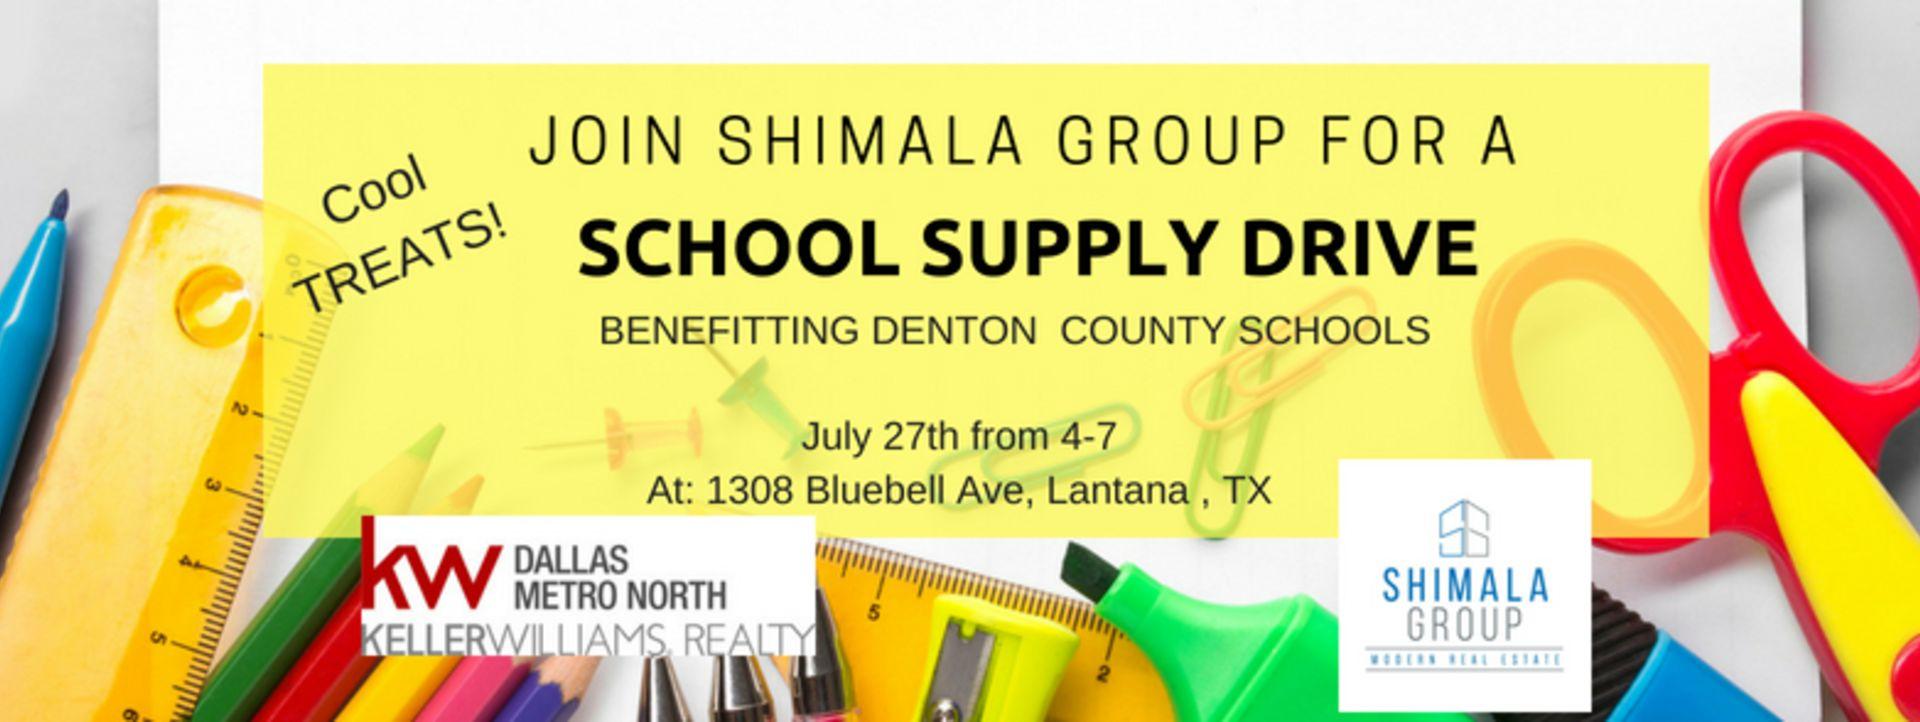 Shimala Group Back To School drive benefitting KW CARES